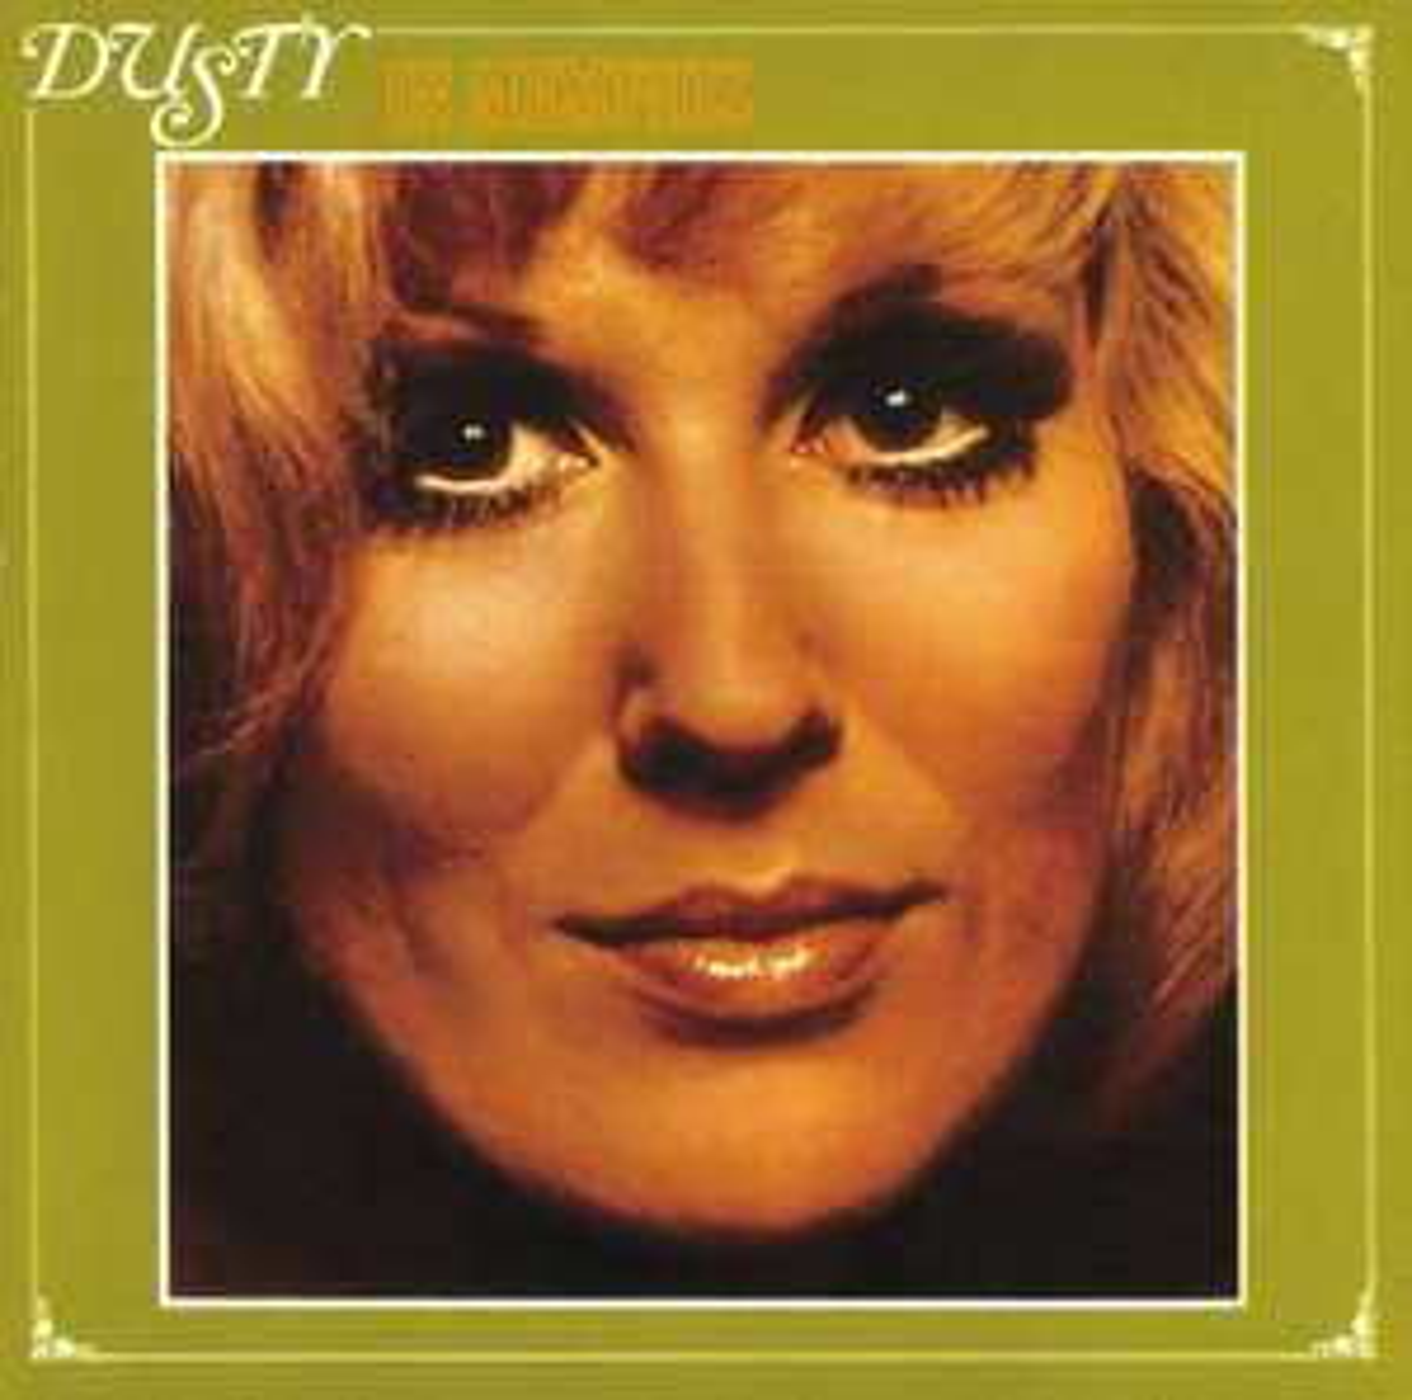 Dusty Springfield - Dusty in Memphis (Vinyl) £8.99 (Prime) / £11.98 (non Prime) at Amazon